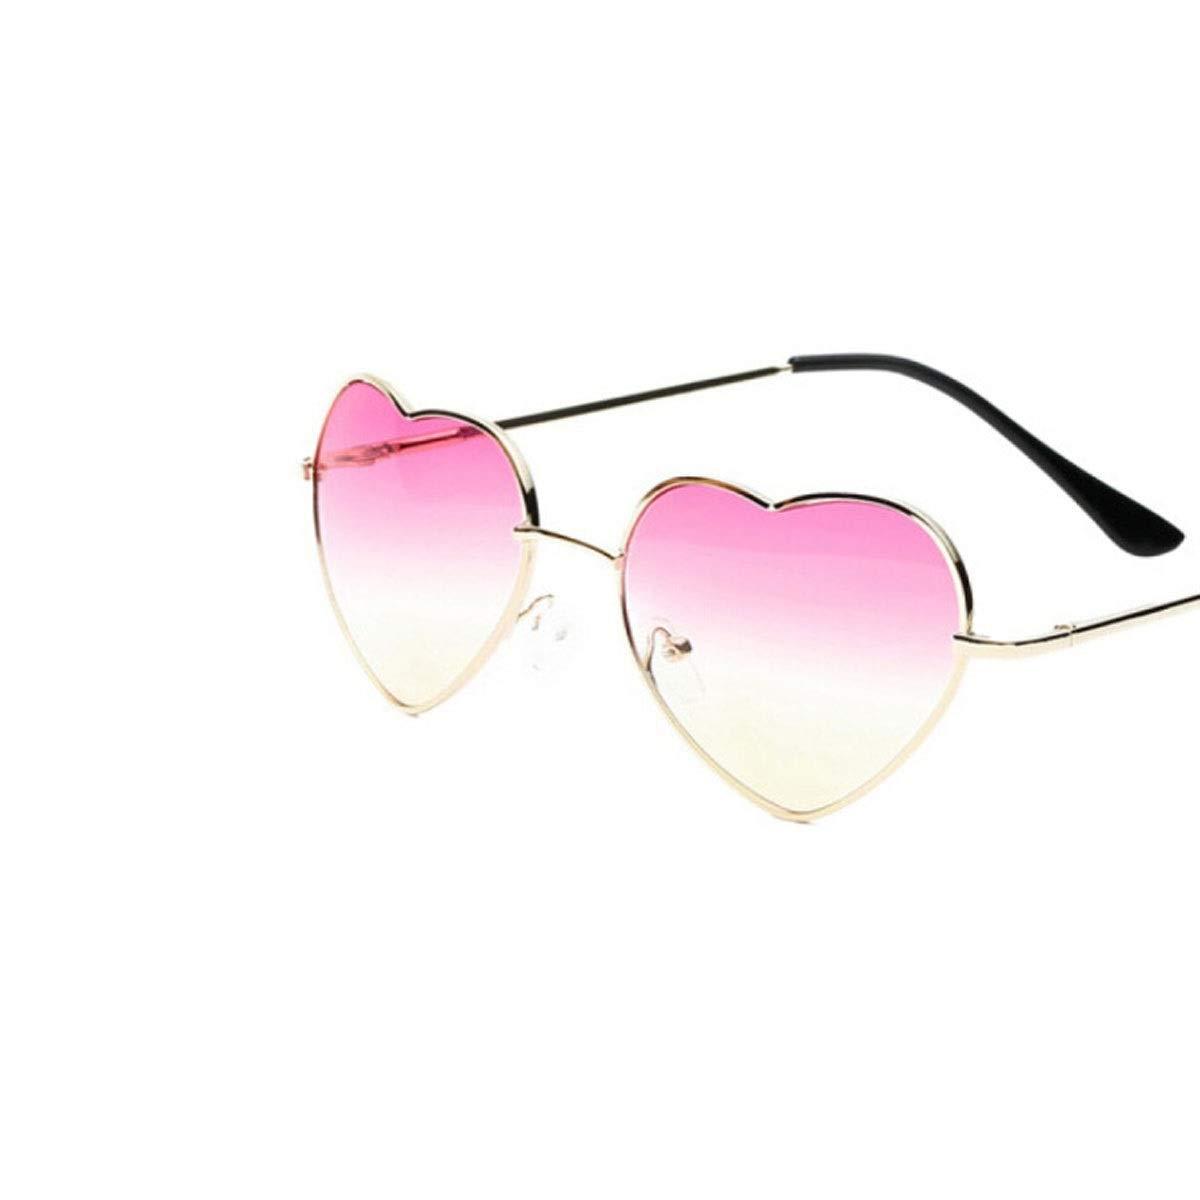 Hengtongtongxun Gafas de Sol de, Gafas de Sol de Hombre y ...